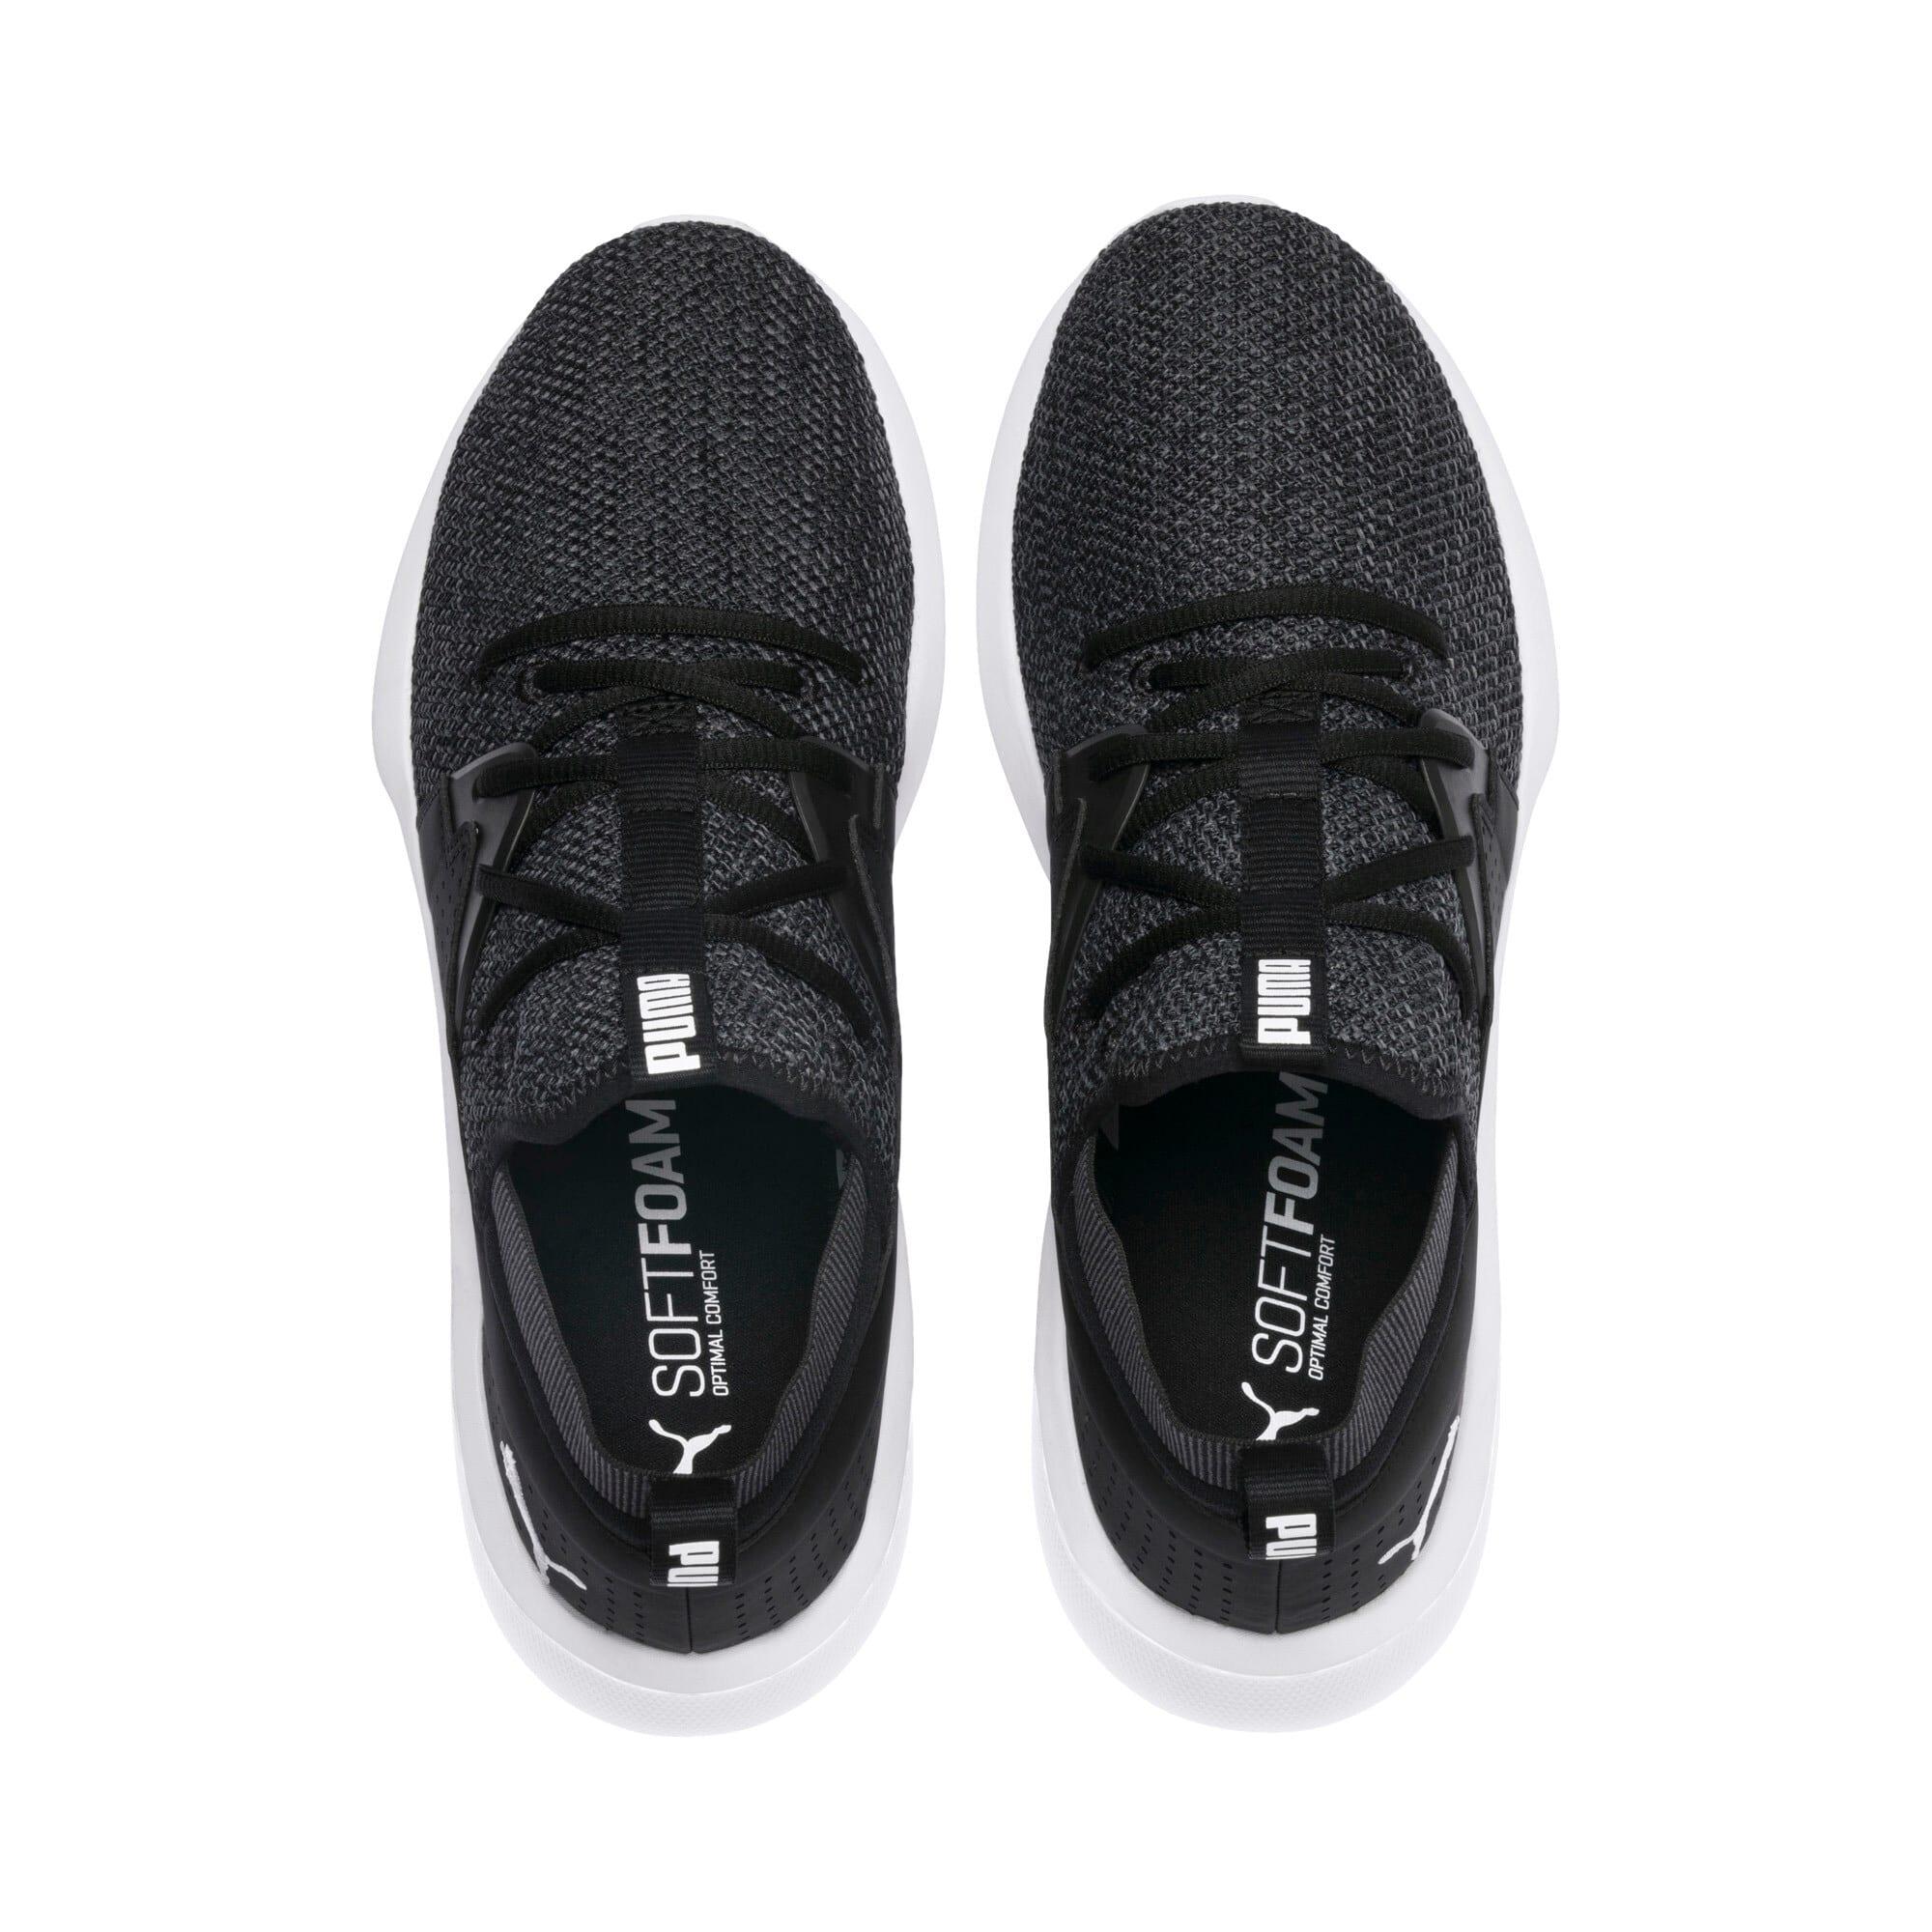 Thumbnail 6 of Emergence Men's Sneakers, Puma Black-Puma White, medium